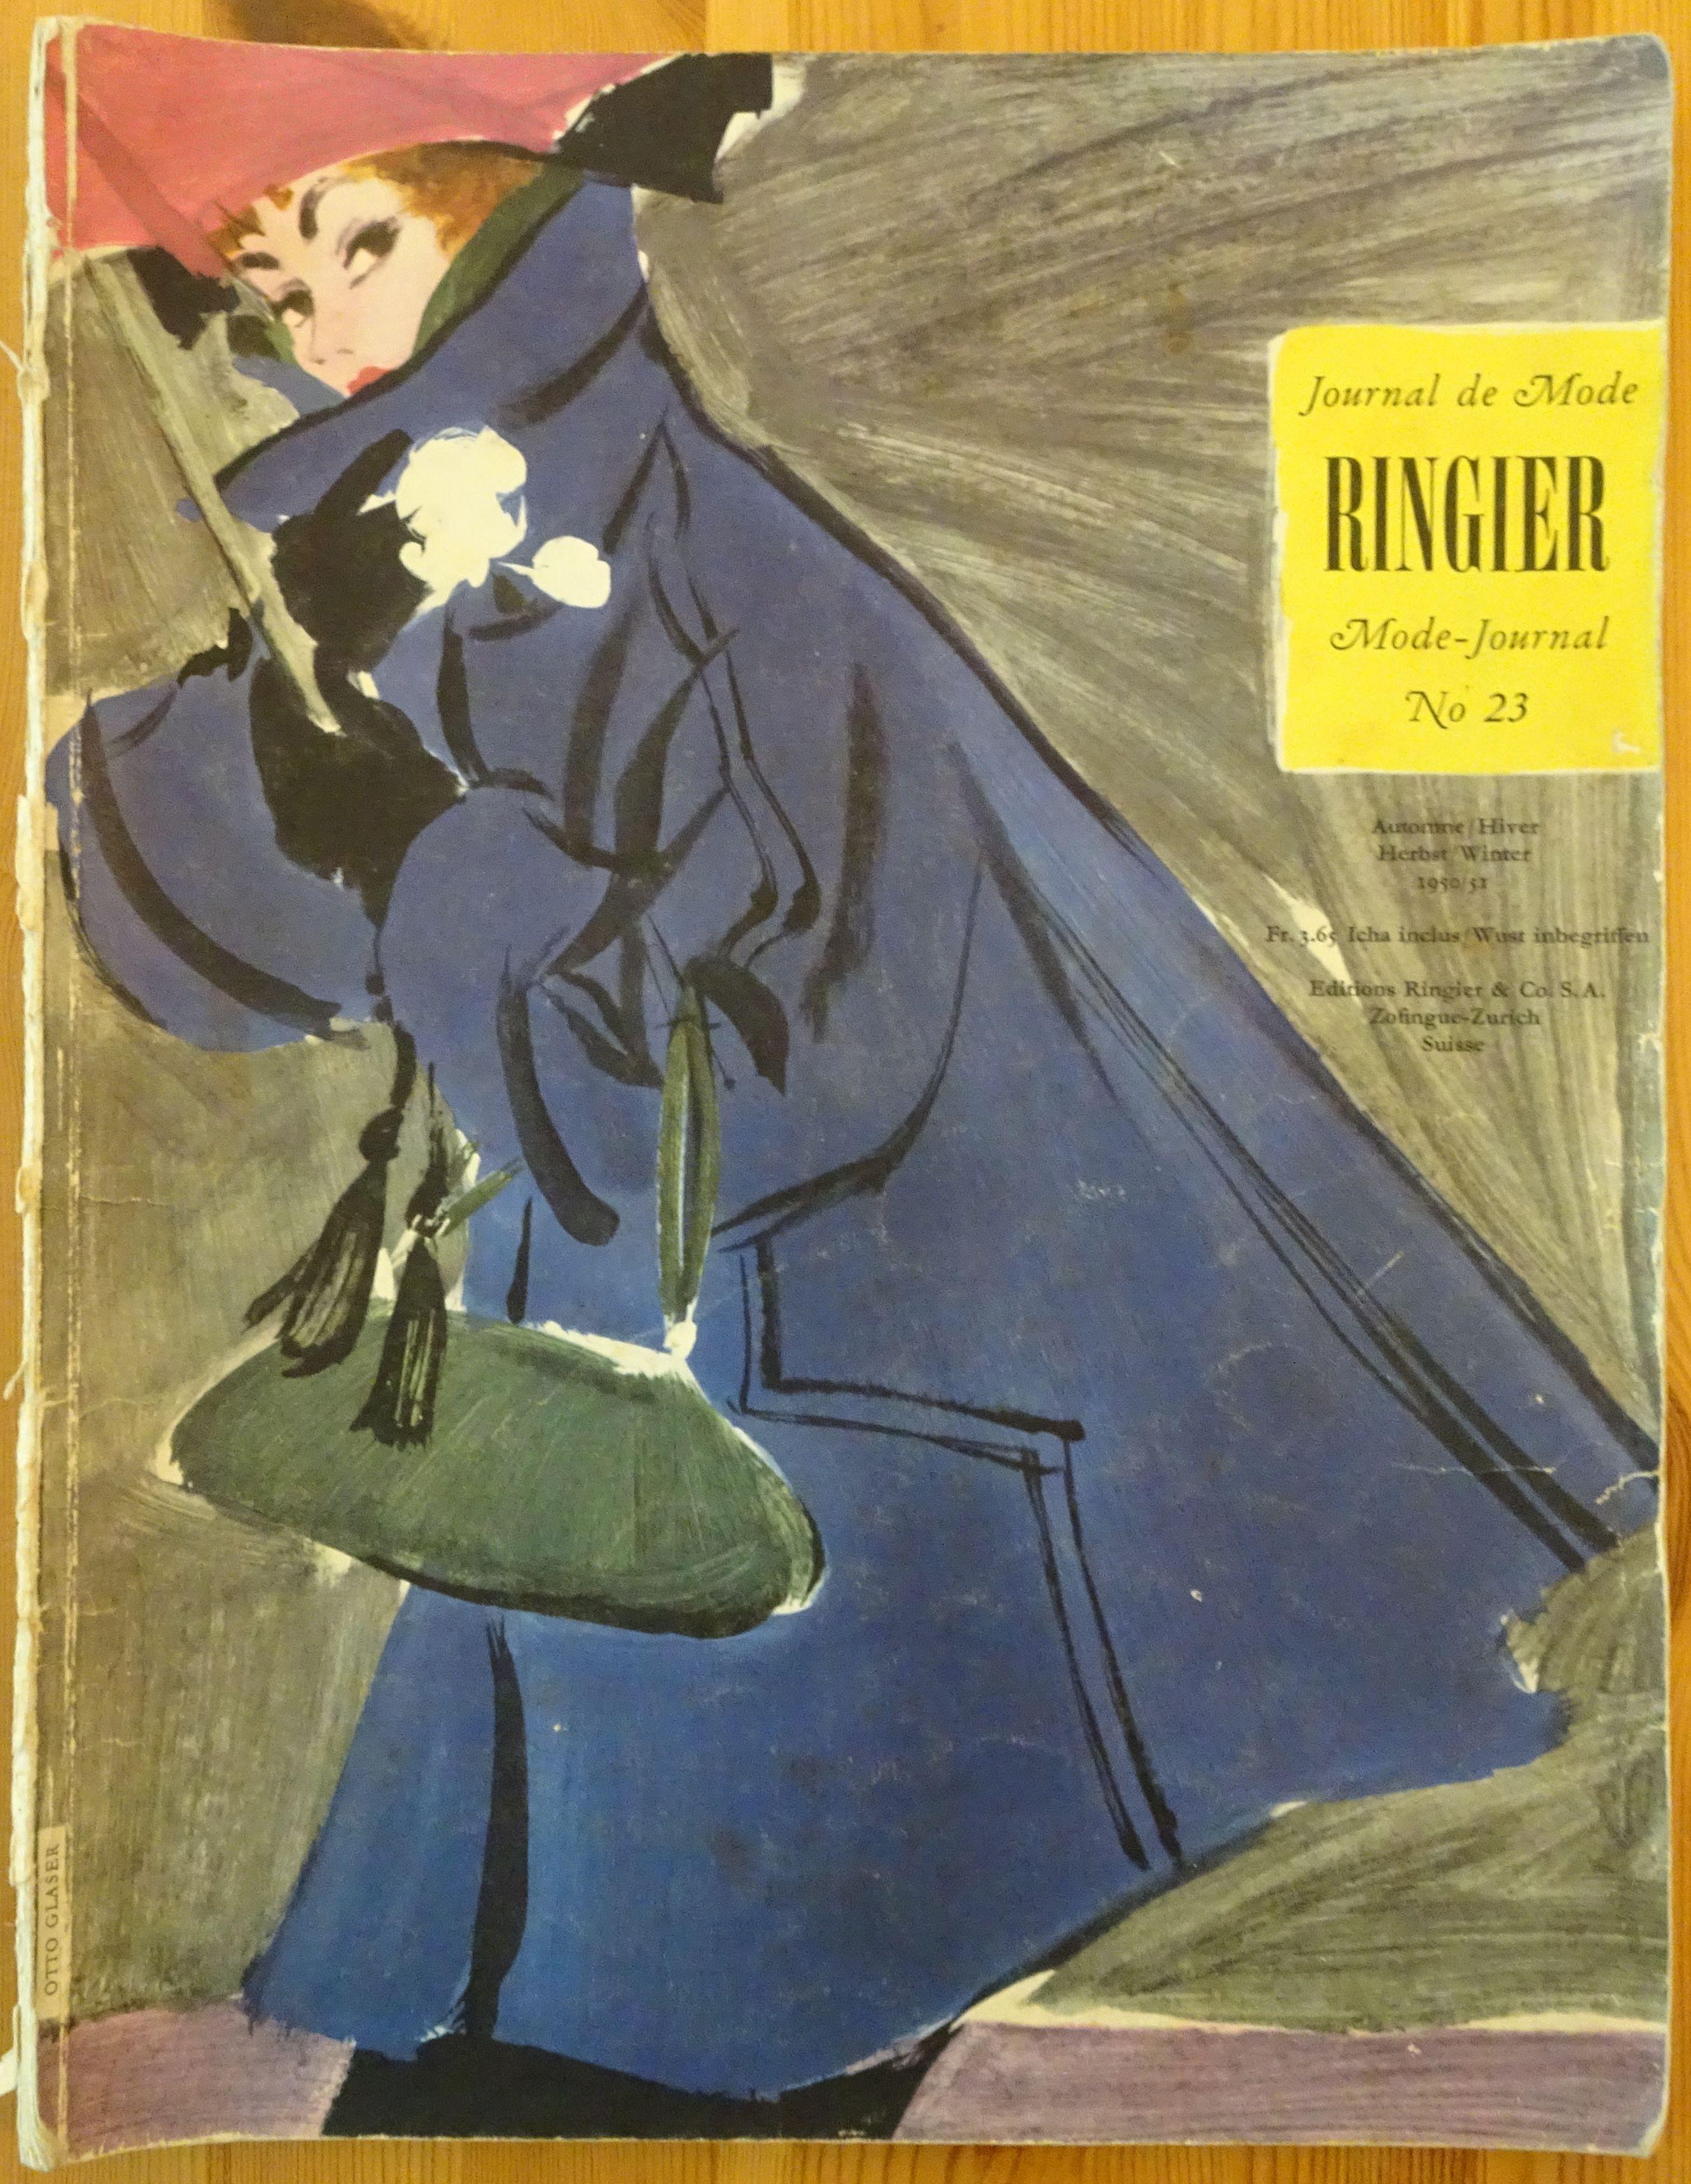 Ringier Journal de Mode Autumn/Winter 1950/51